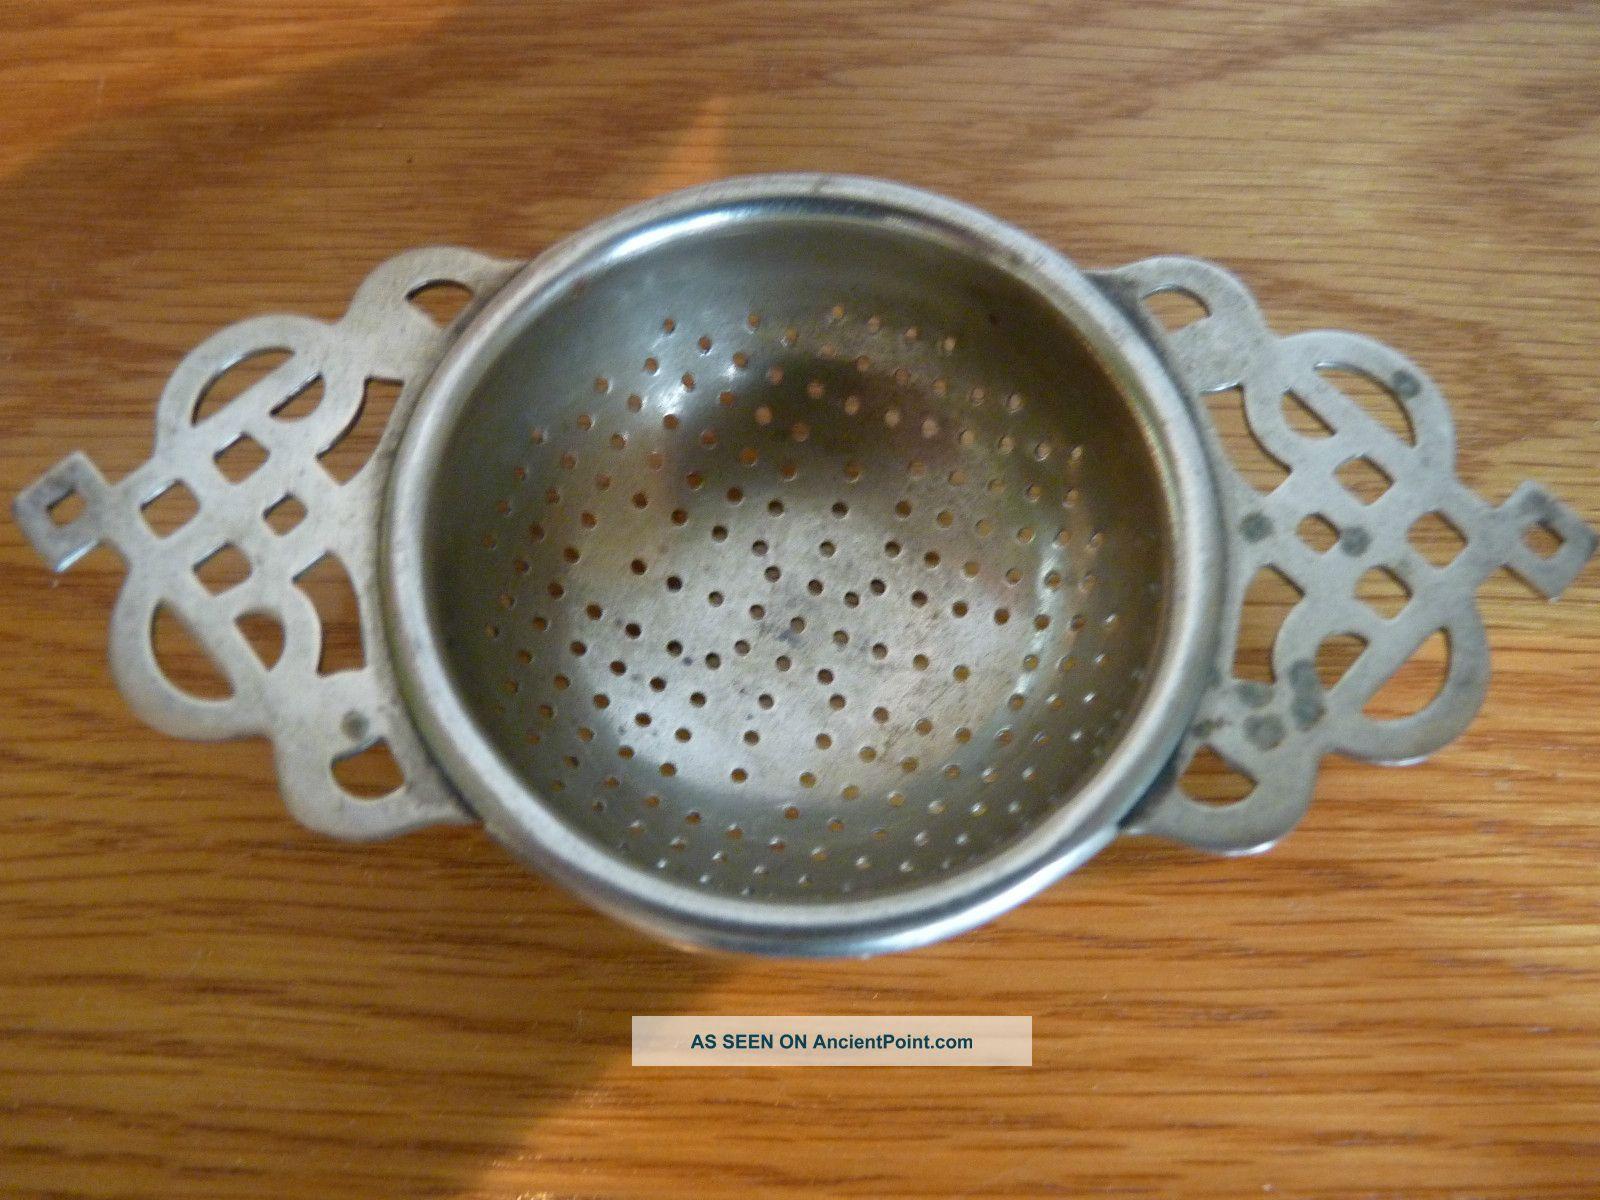 C1920 Art Deco Epns Silver Plated Lugged Tea Strainer Art Deco photo